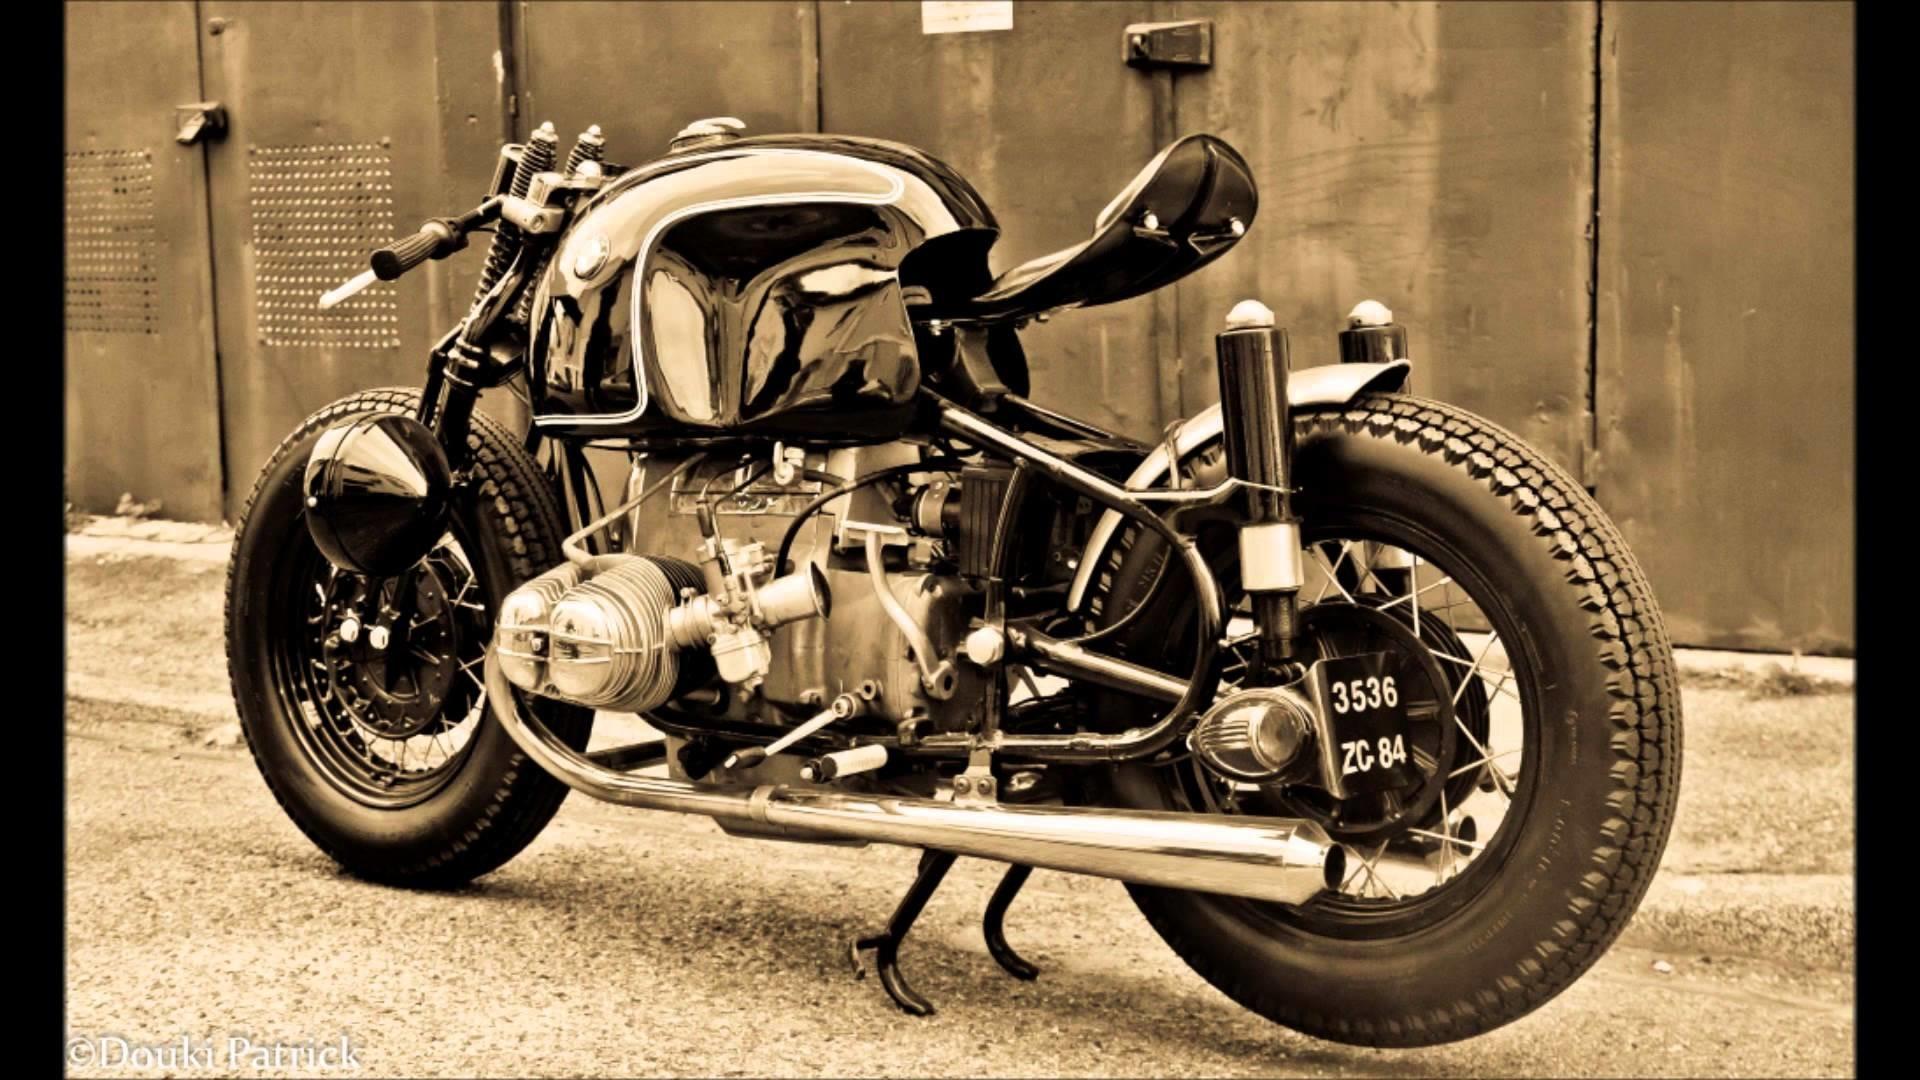 Une Honda VT 500 E custom signée Micho's Garage Motorcycles : good job !    MotorBikes … nude & beautiful / Motorräder … nackt & wunderschön    Pinterest …